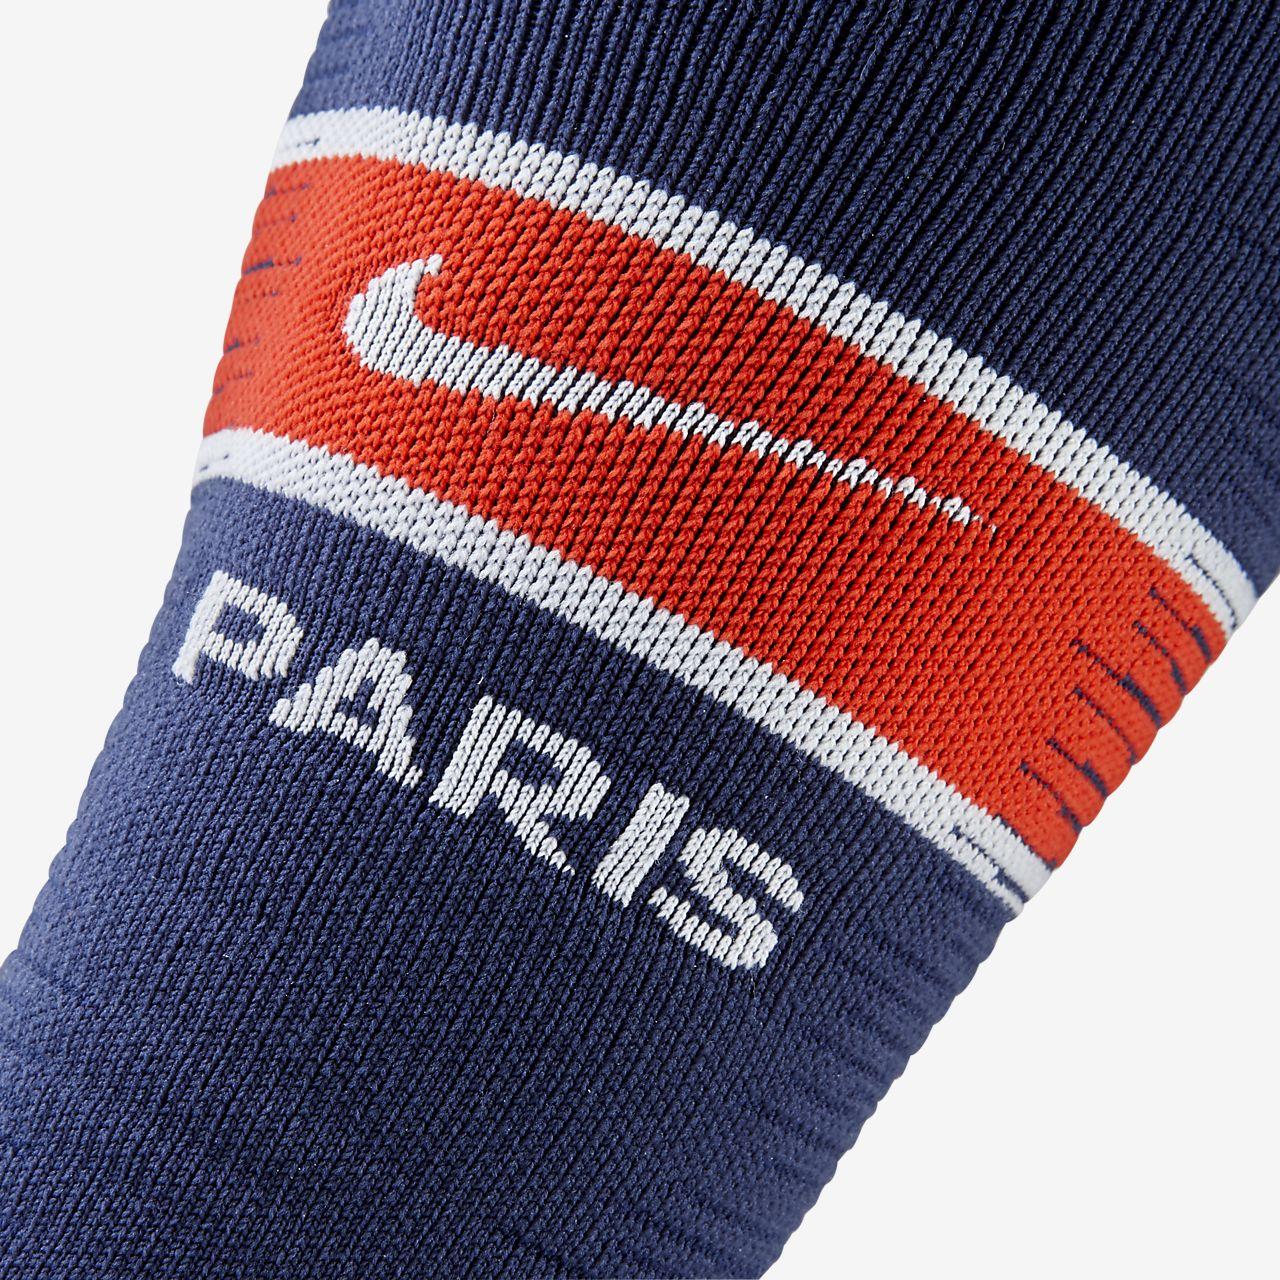 f61133c149c3 2018 19 Paris Saint-Germain Match Home Away OTC Football Socks. Nike ...